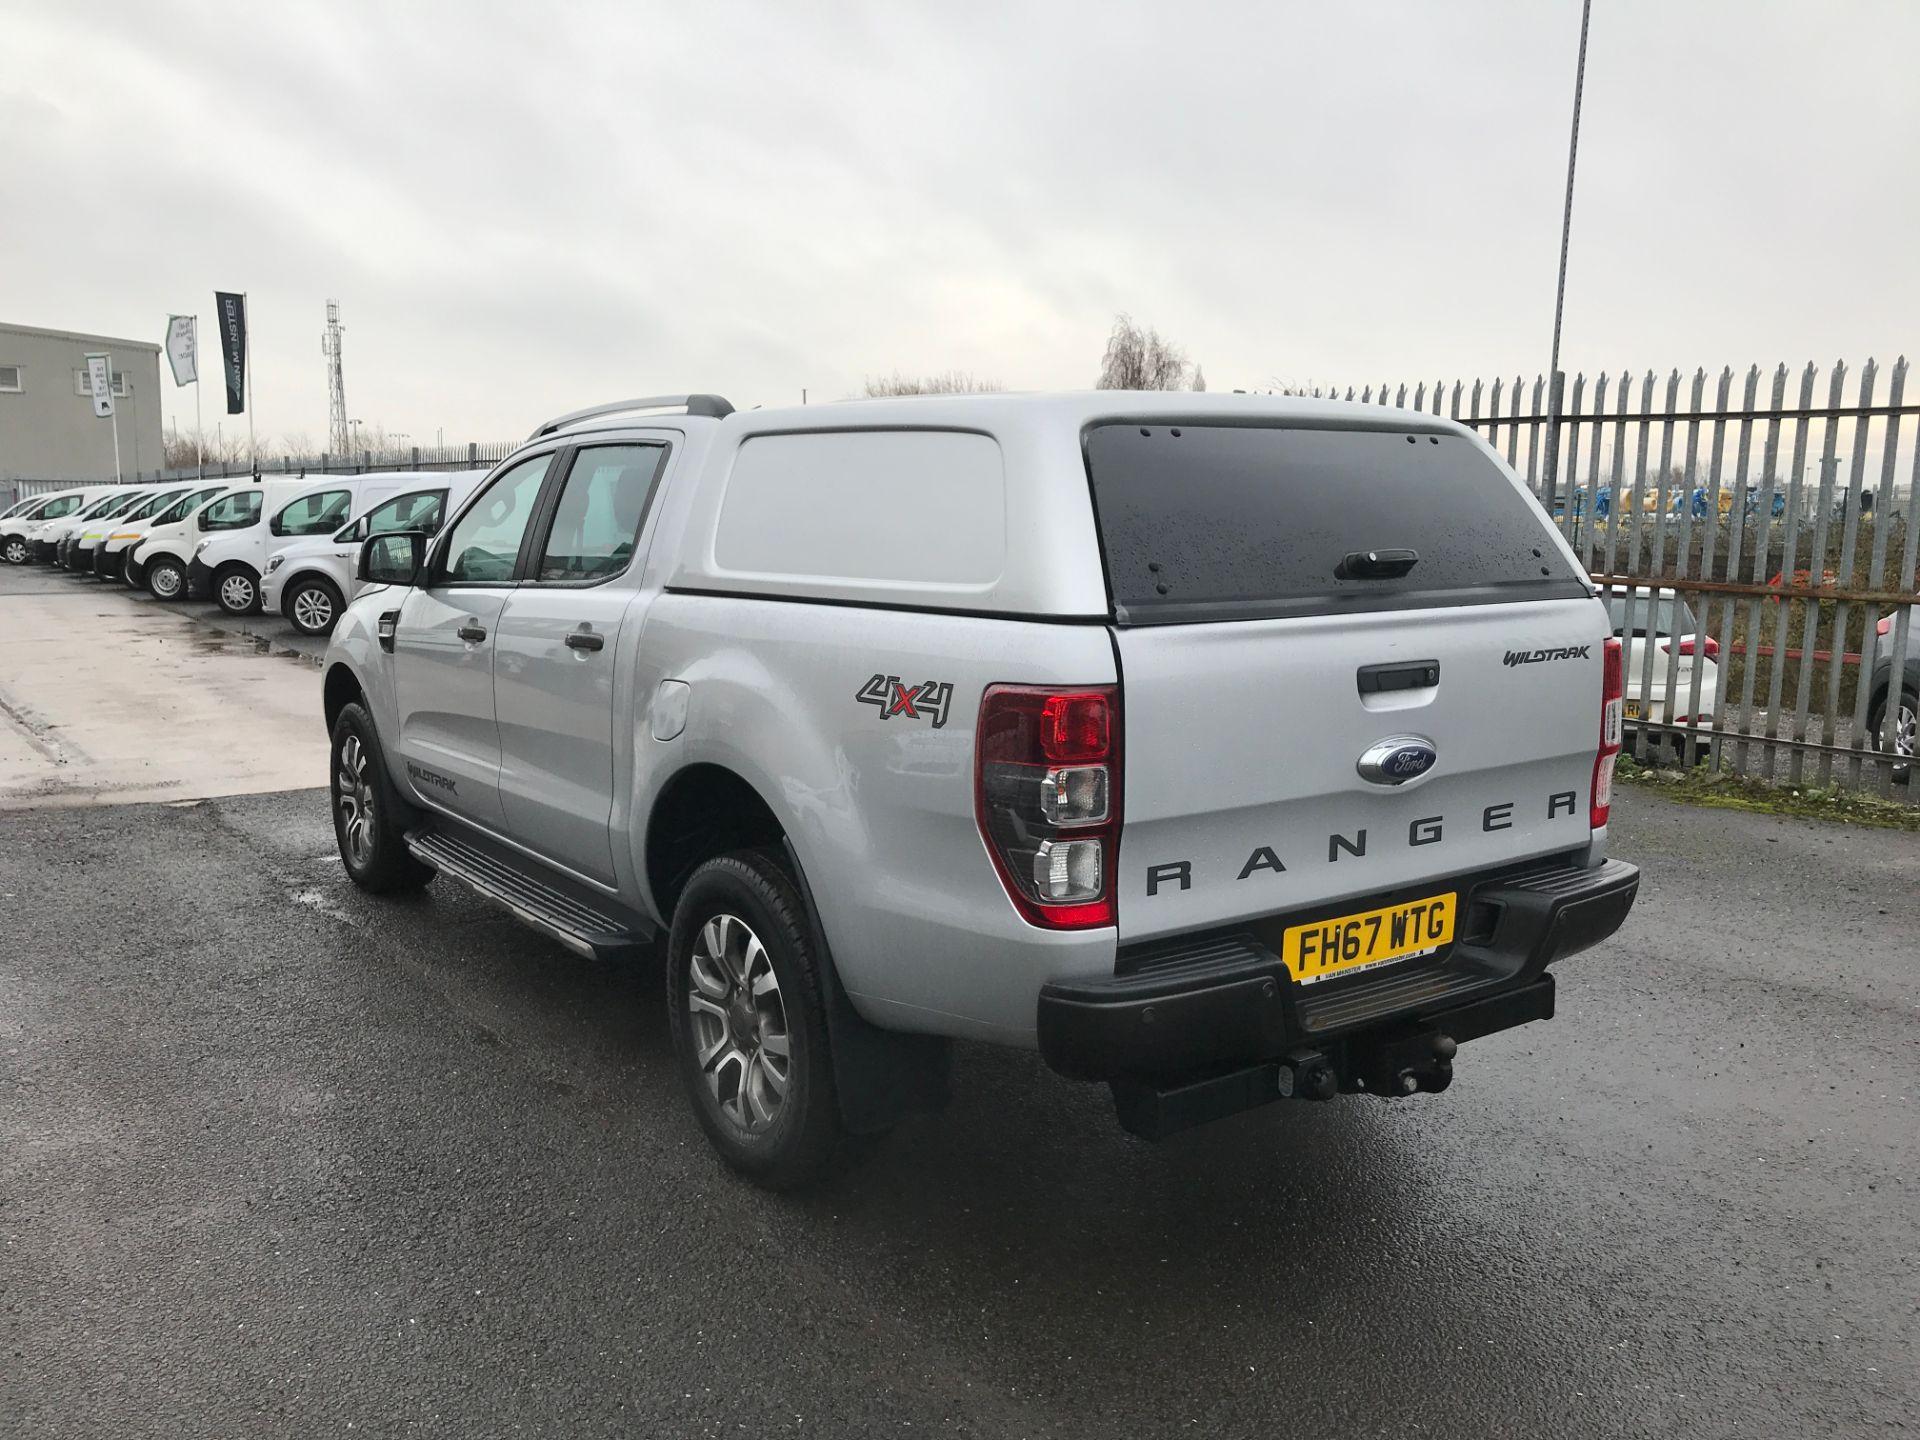 2018 Ford Ranger DOUBLE CAB 4X4 WILDTRAK 3.2TDI 200PS EURO 5 (FH67WTG) Image 9